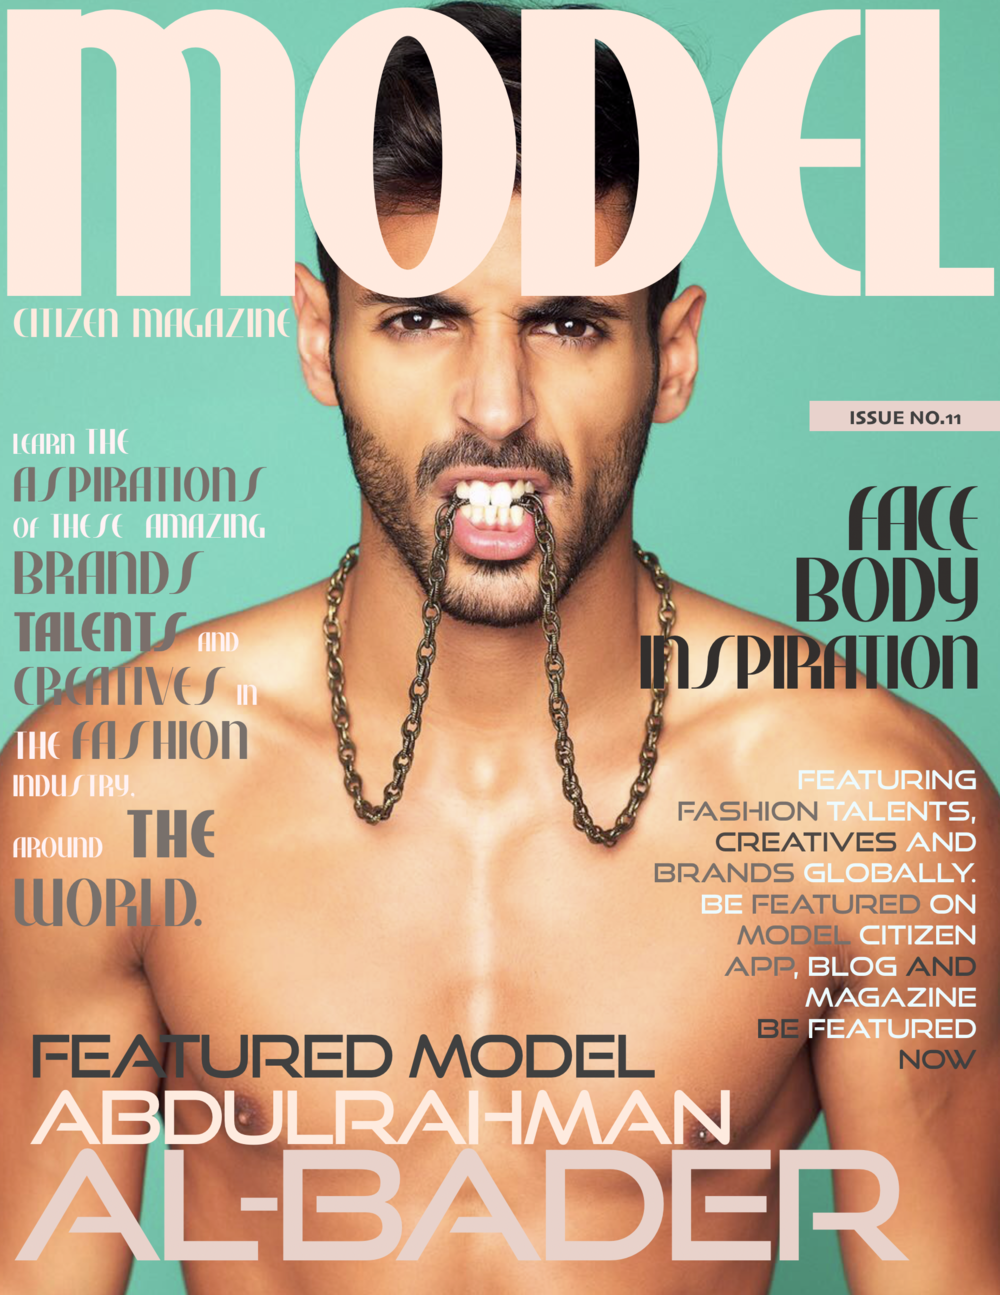 Abdulrahman Al-Bader, Model Citizen Magazine